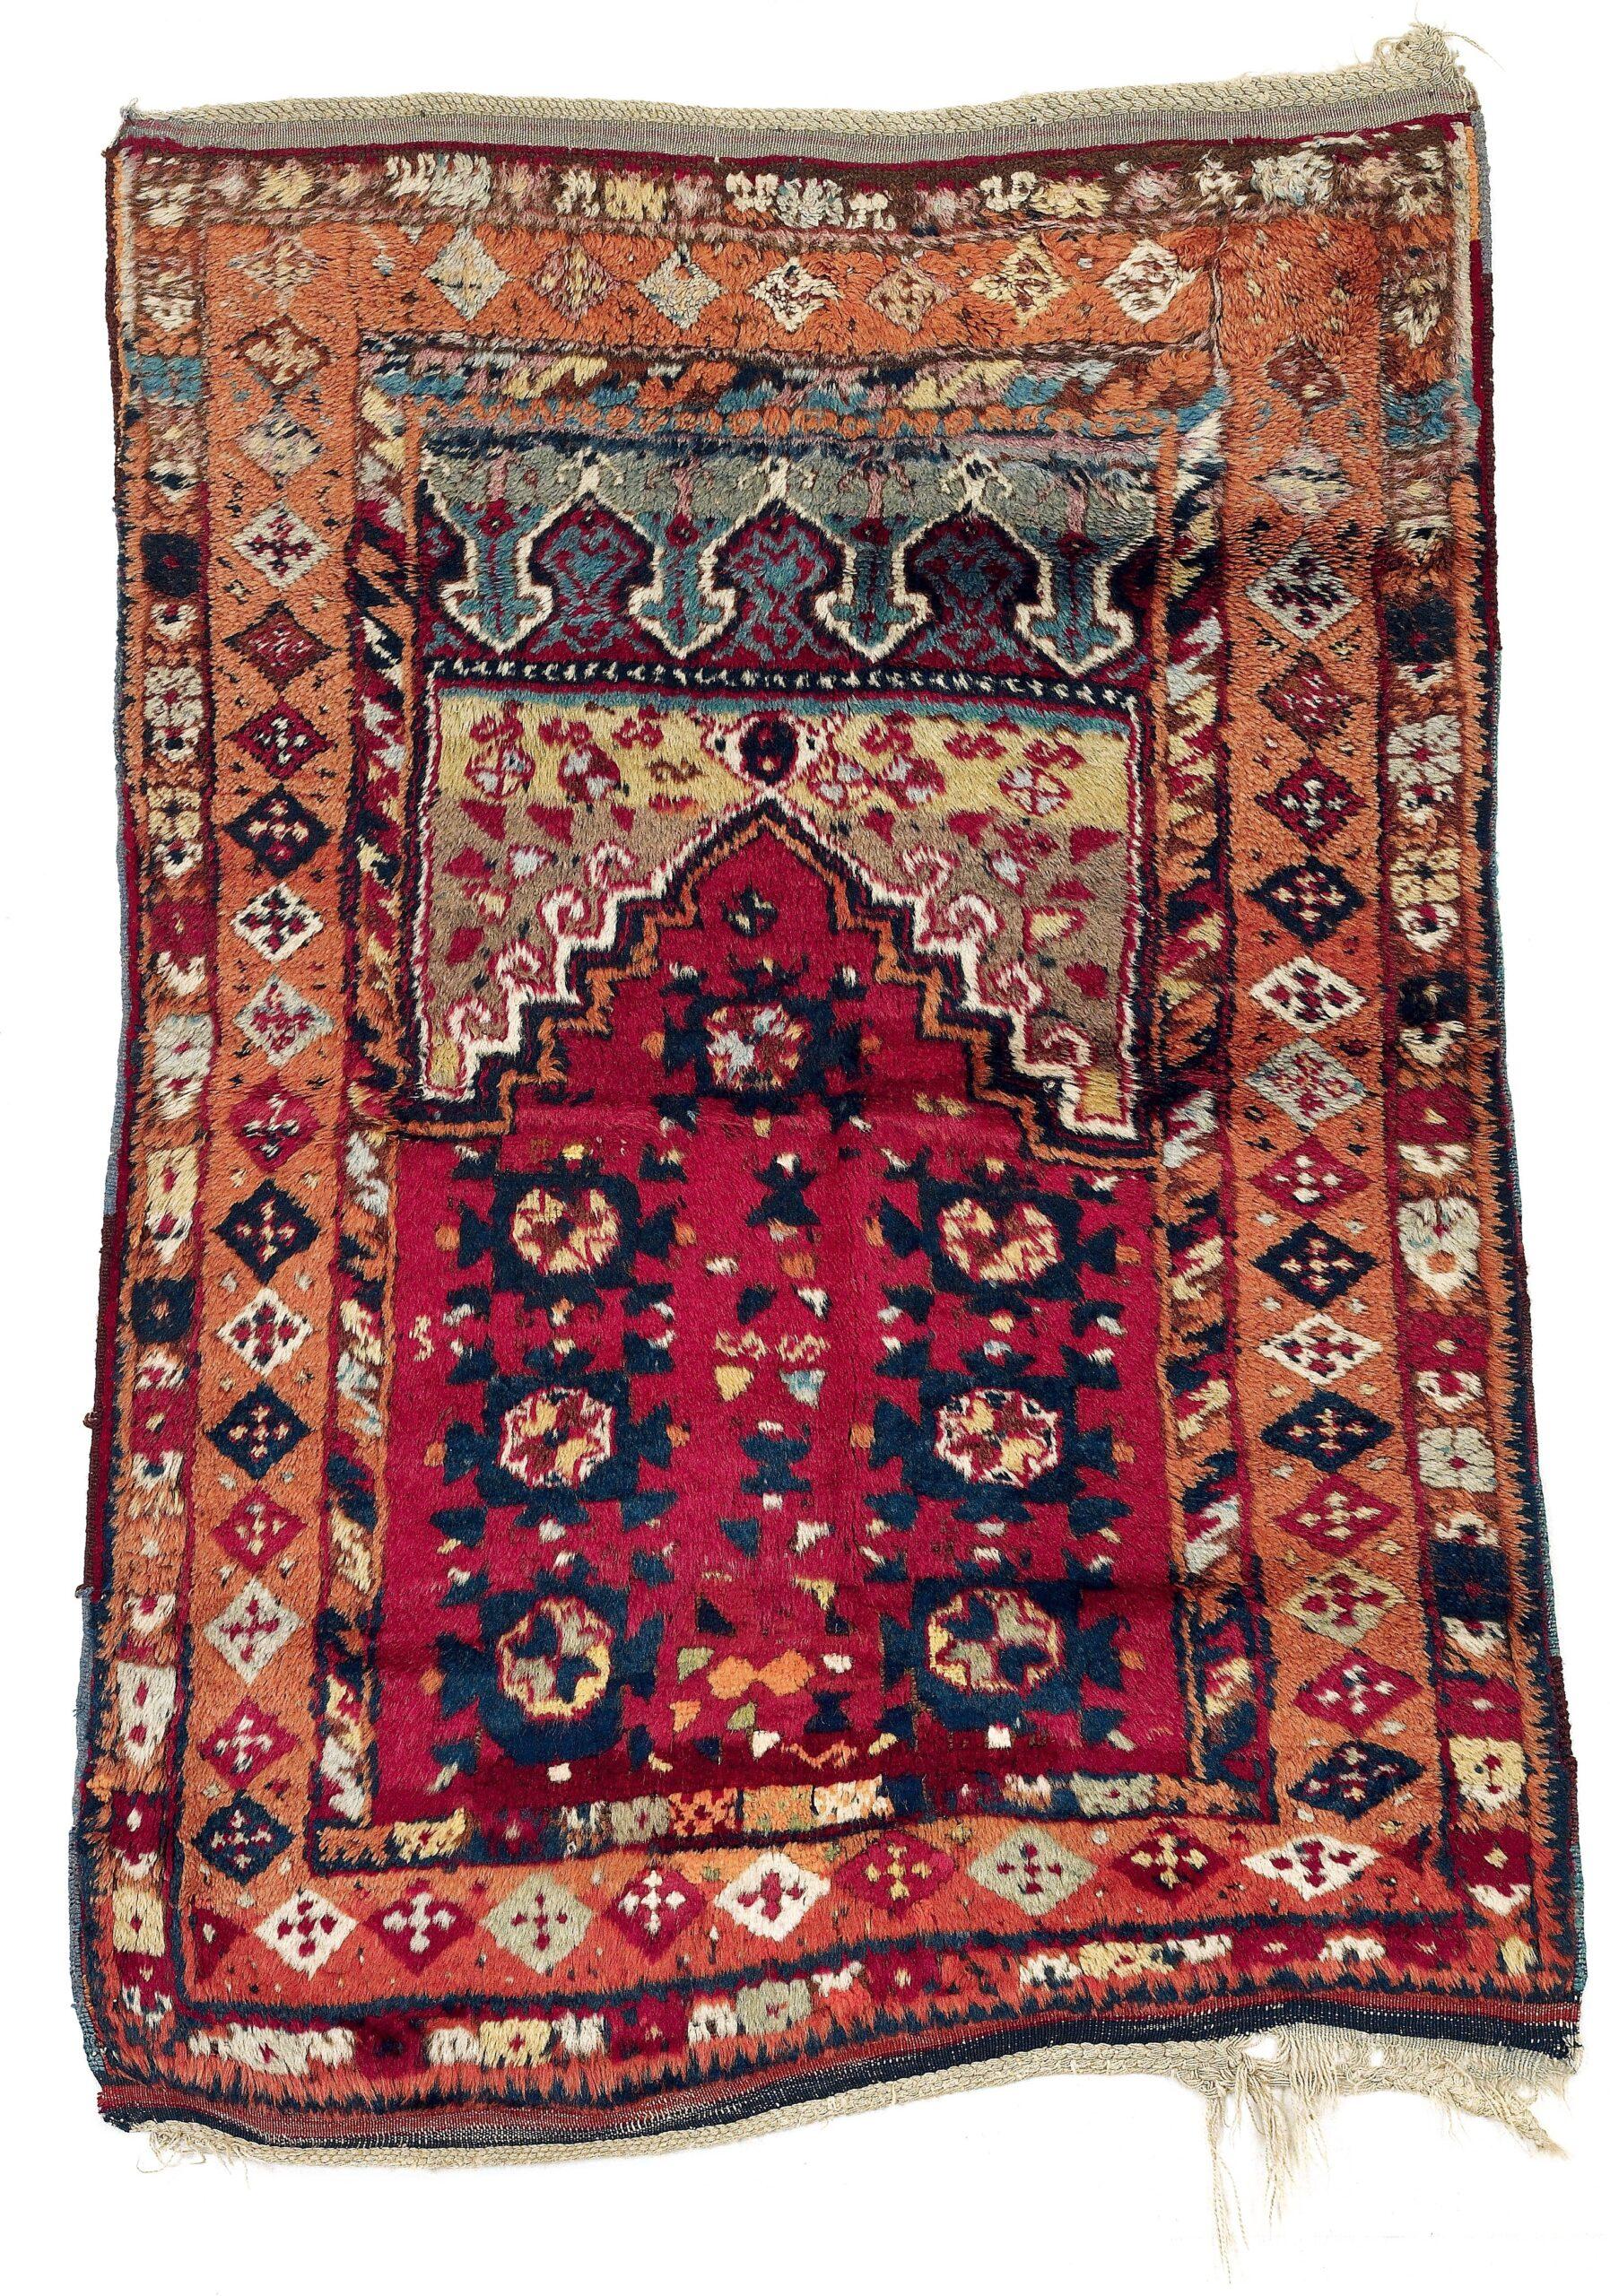 Eastern Anatolian prayer rug, mid-19th century